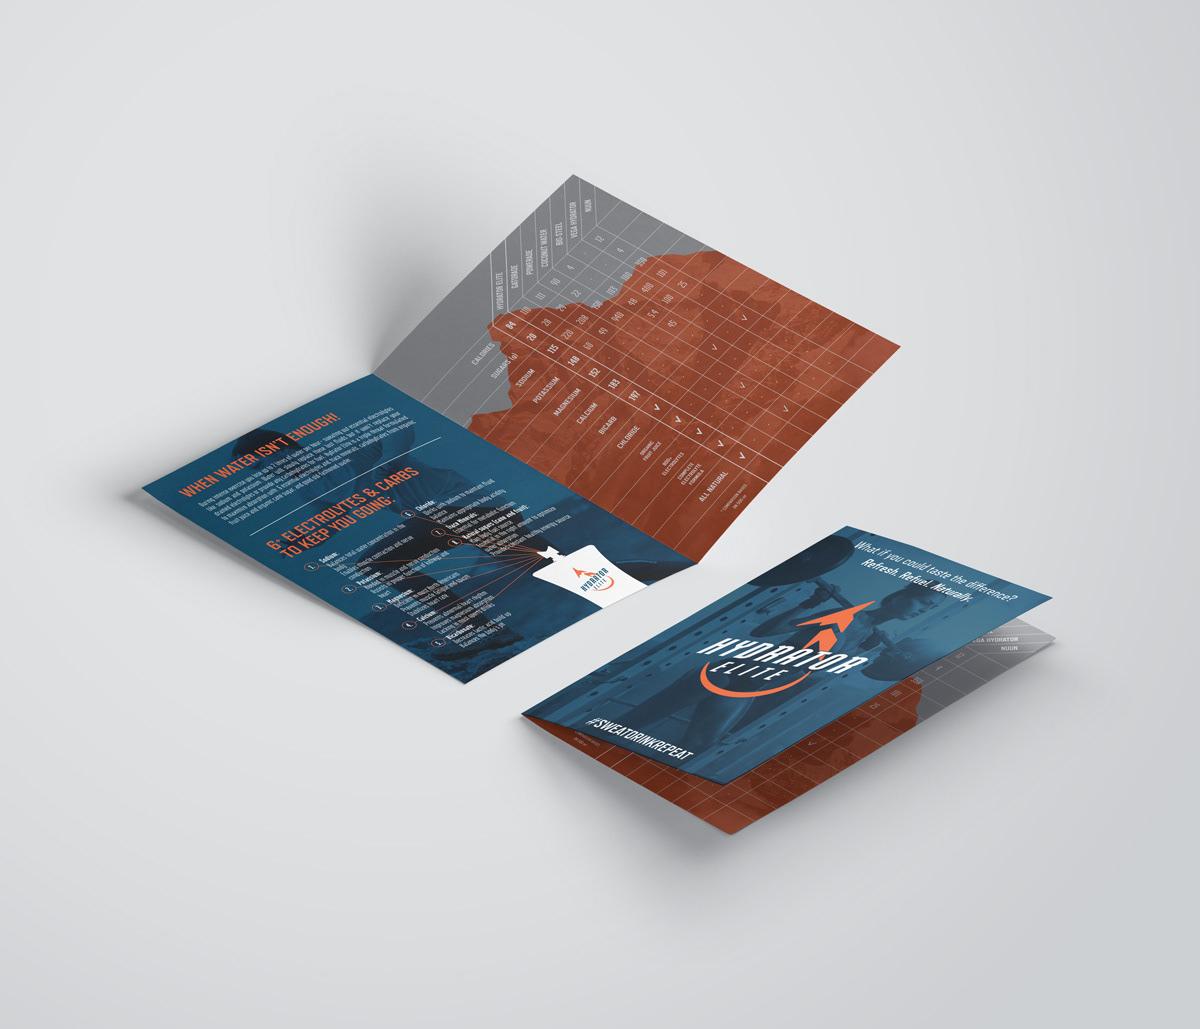 Jaron Mader Designs - Himalayan Hydration